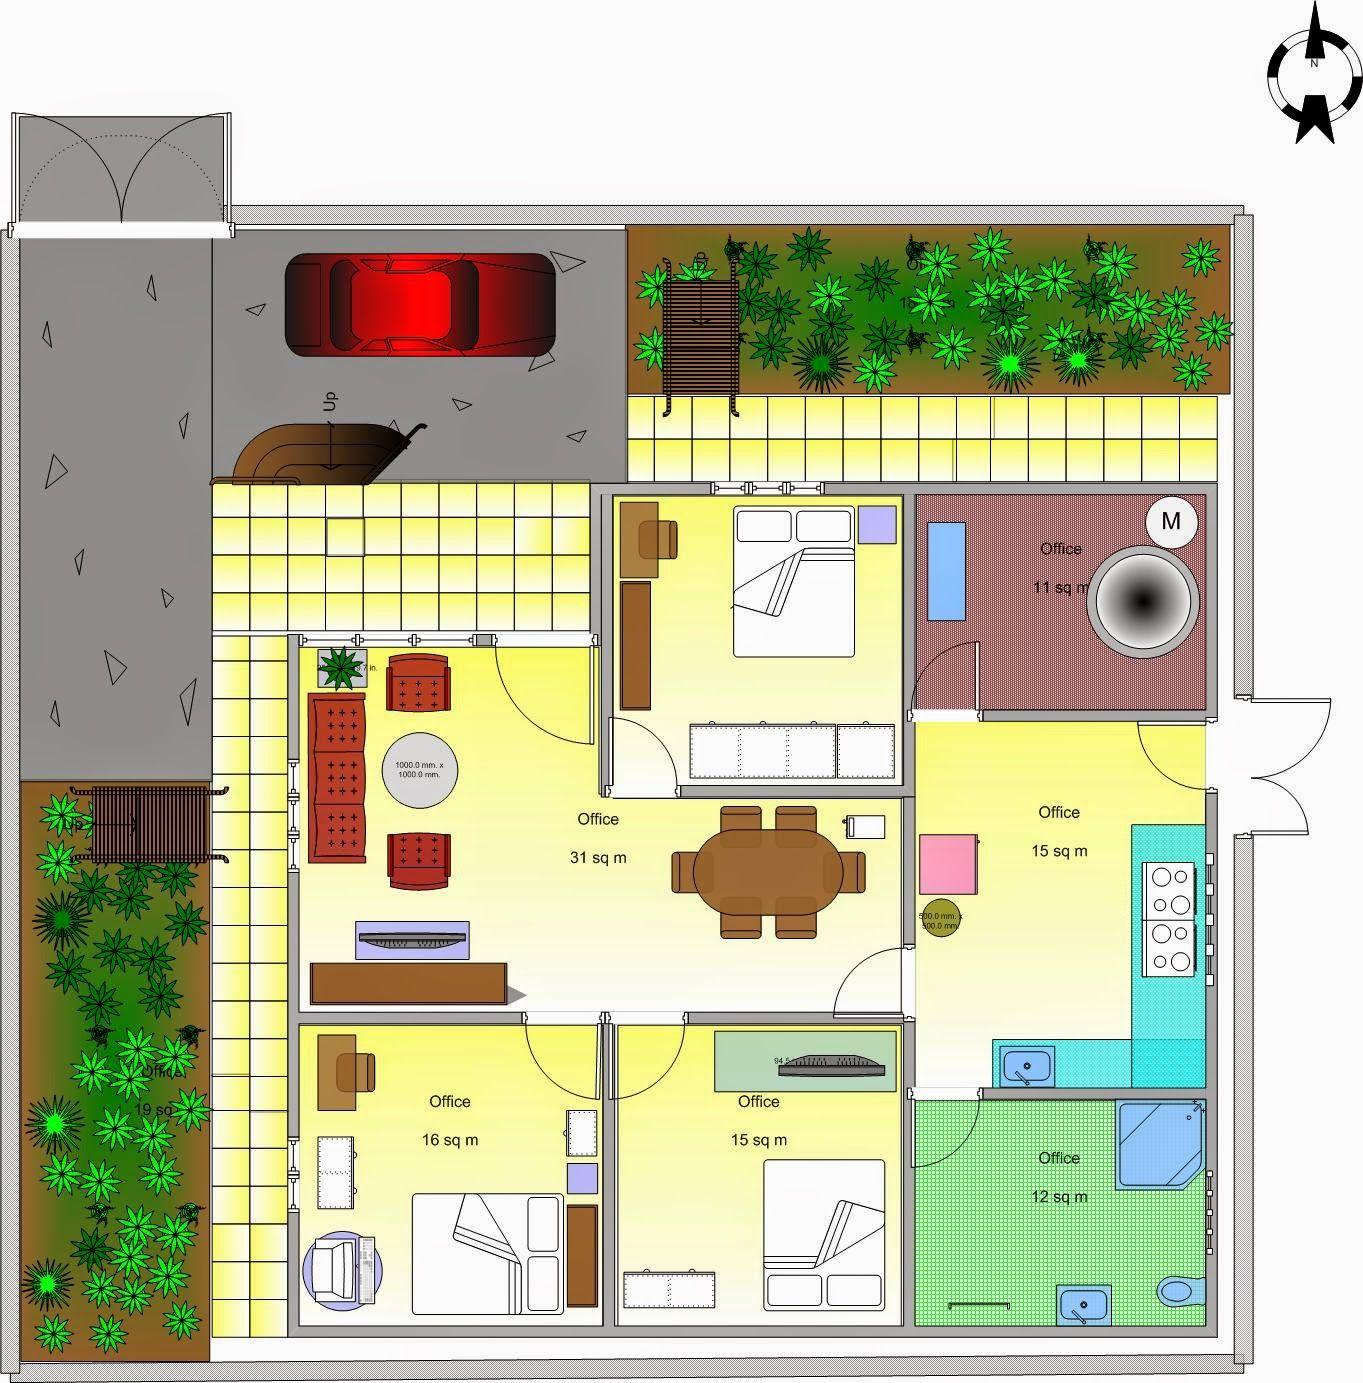 Interior Decor Games House Design Interior House Design Games Cool House Designs Design Your Dream House